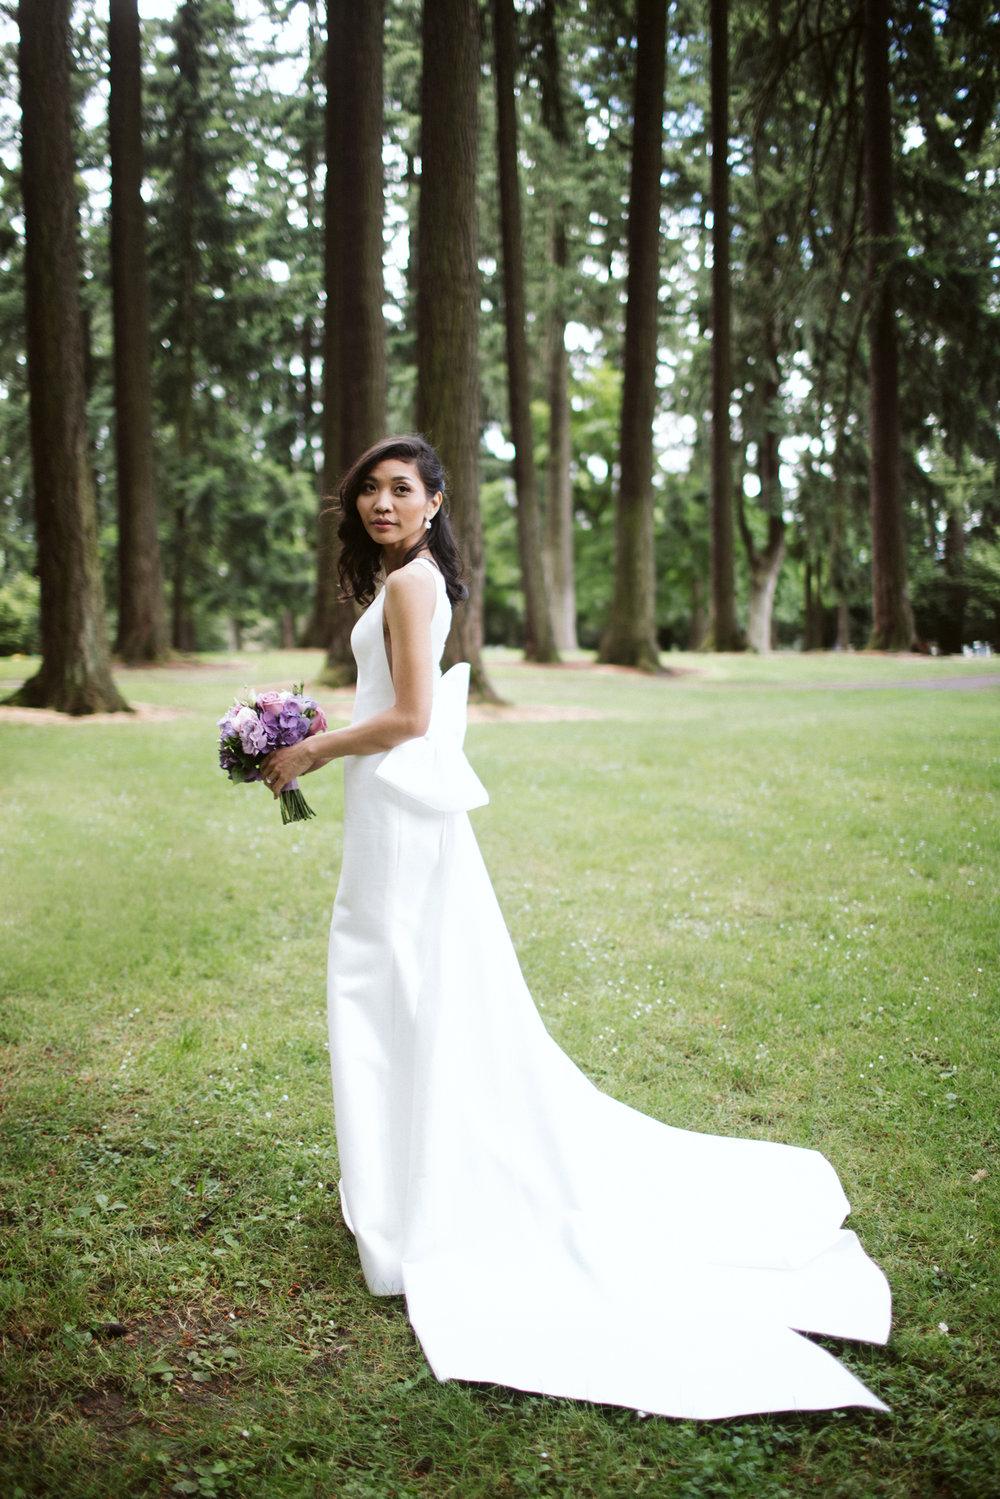 044-daronjackson-jason-picha-wedding.jpg